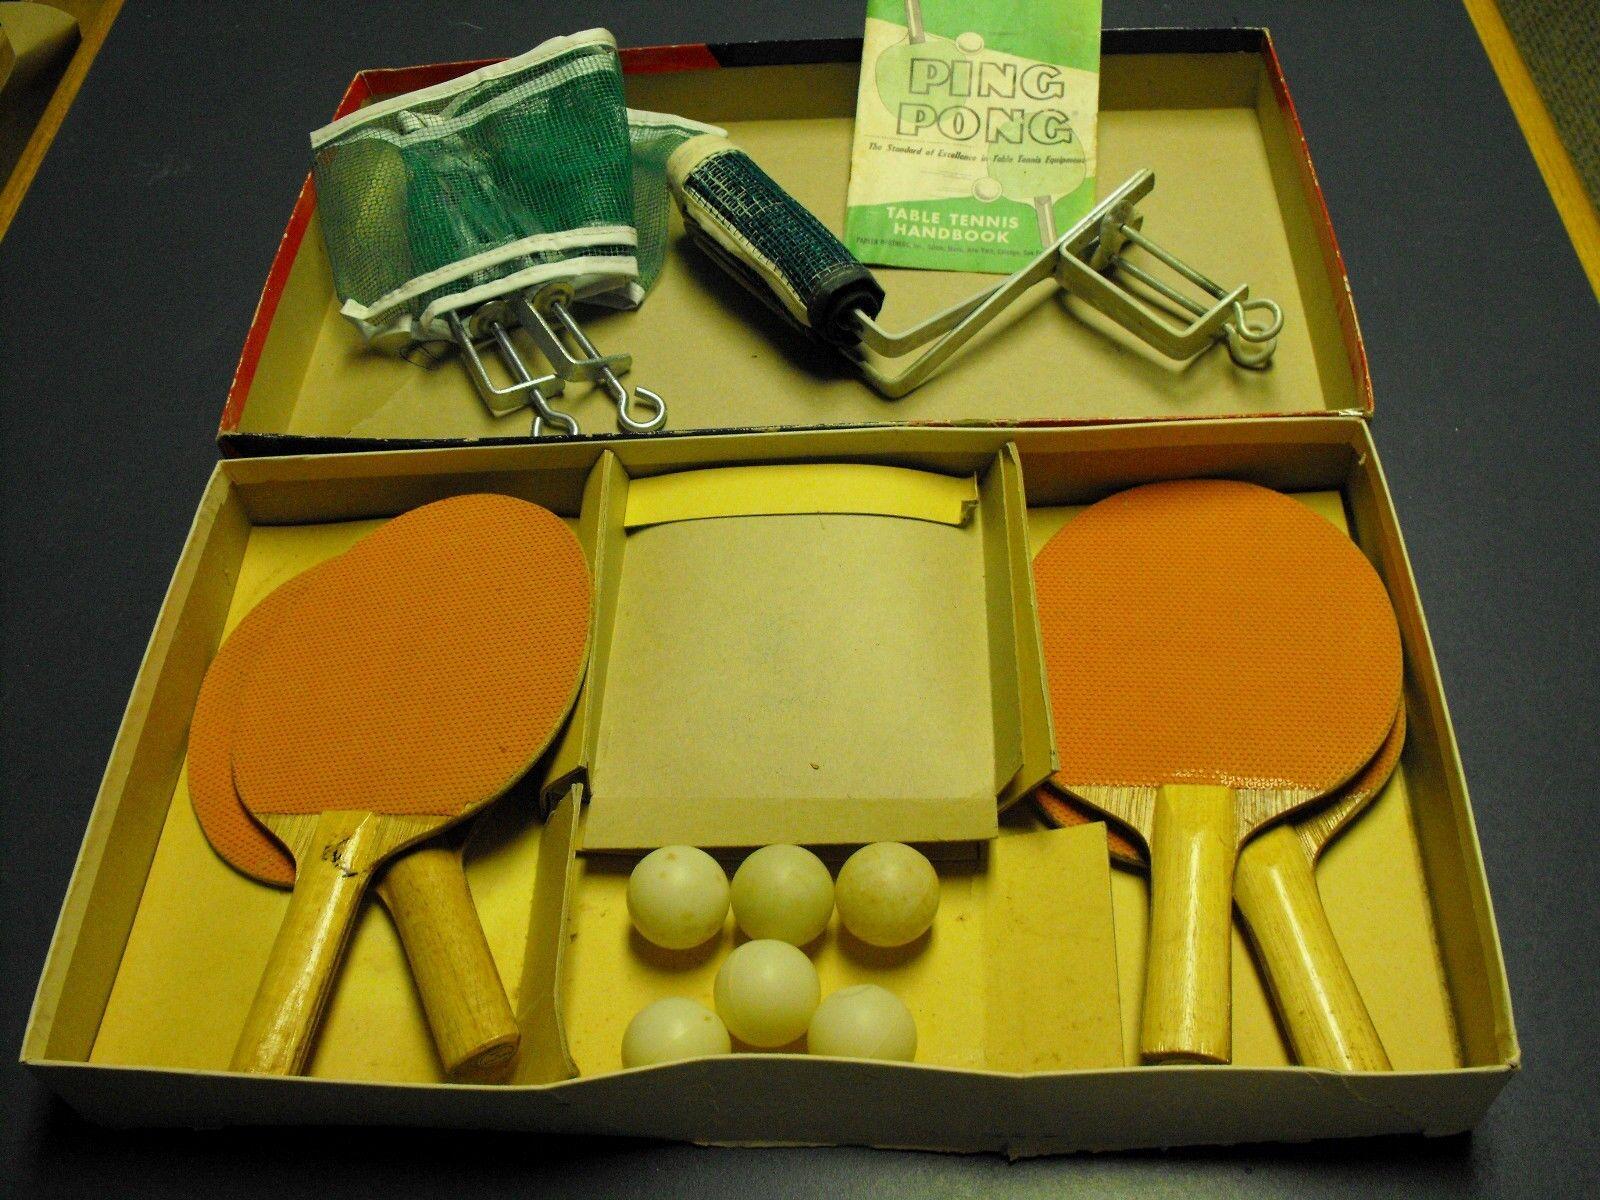 Vintage 1959 PARKER BredHERS PING PONG TABLE TENNIS SET COMPLETE W  INSTRUCTION